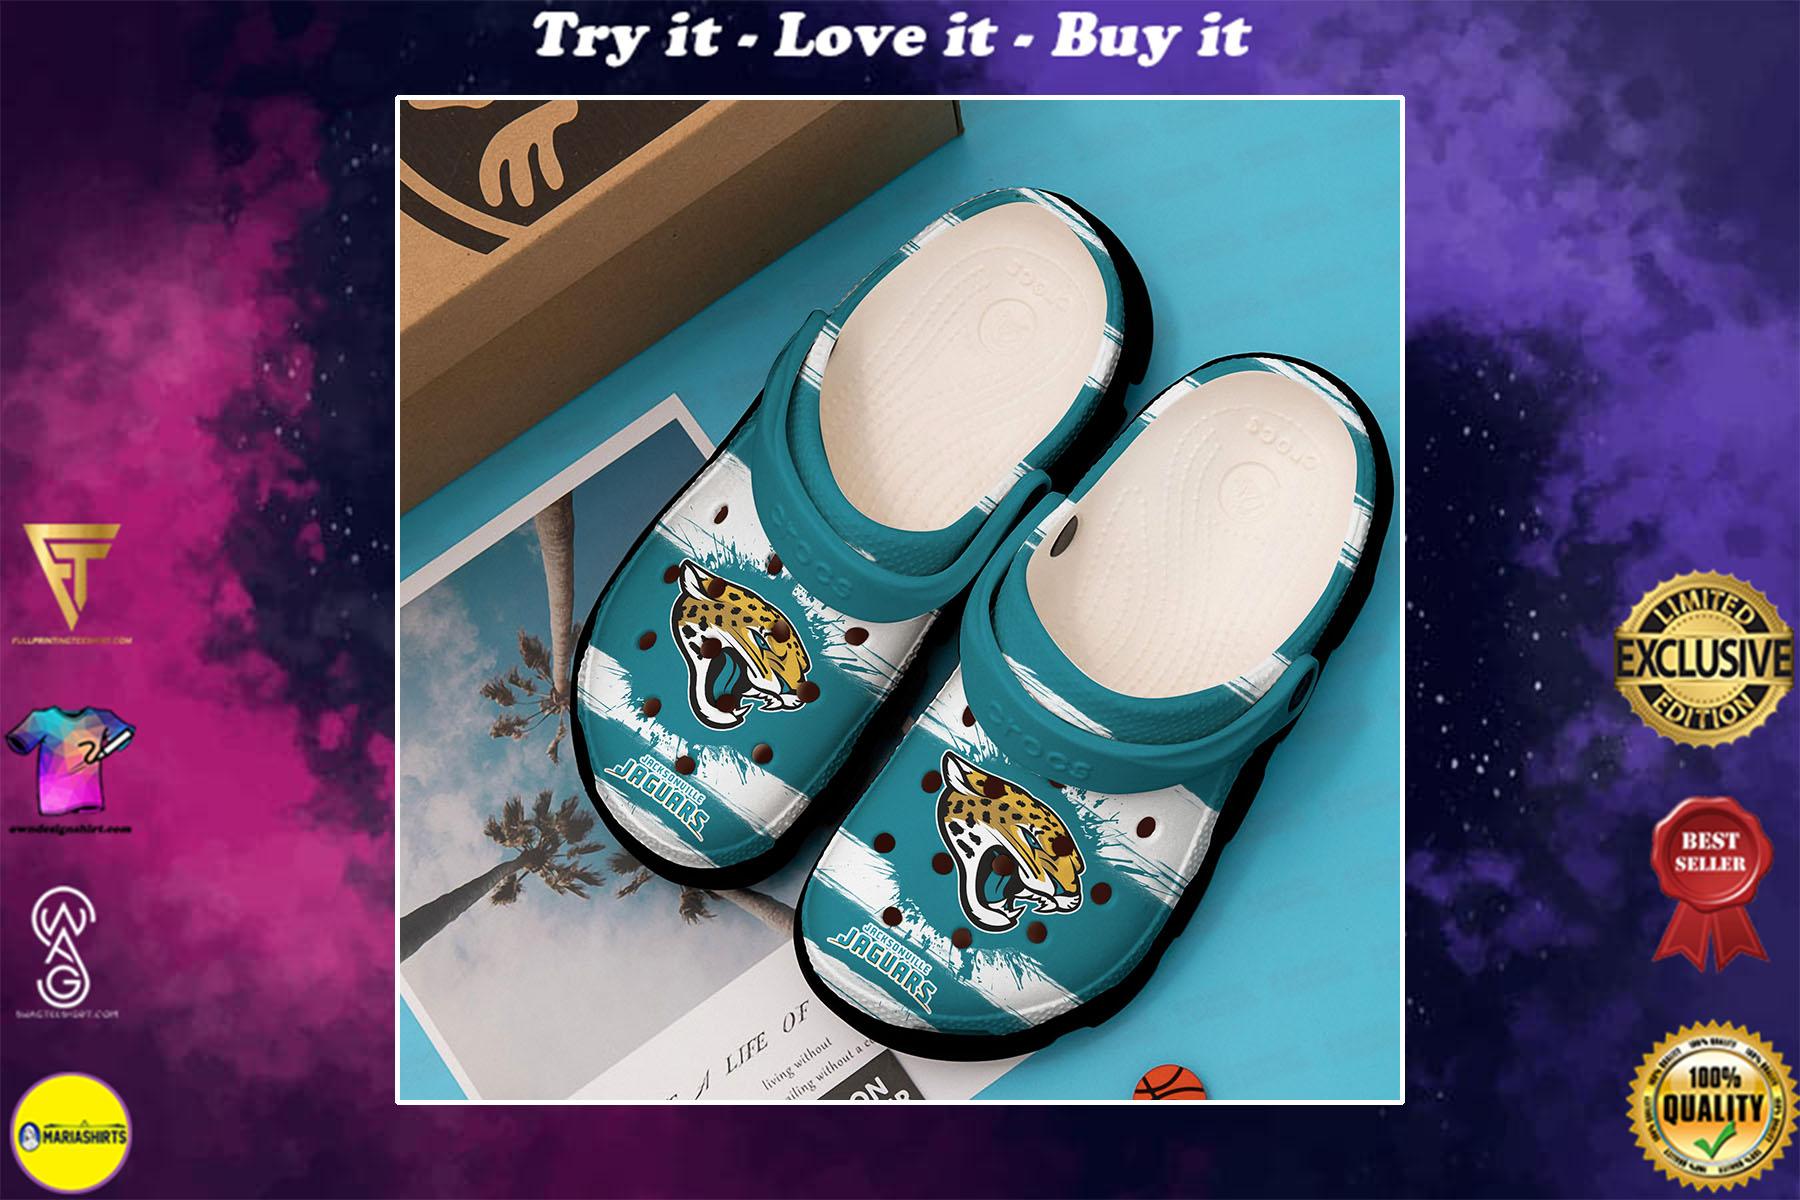 [special edition] national football league jacksonville jaguars crocs shoes - maria